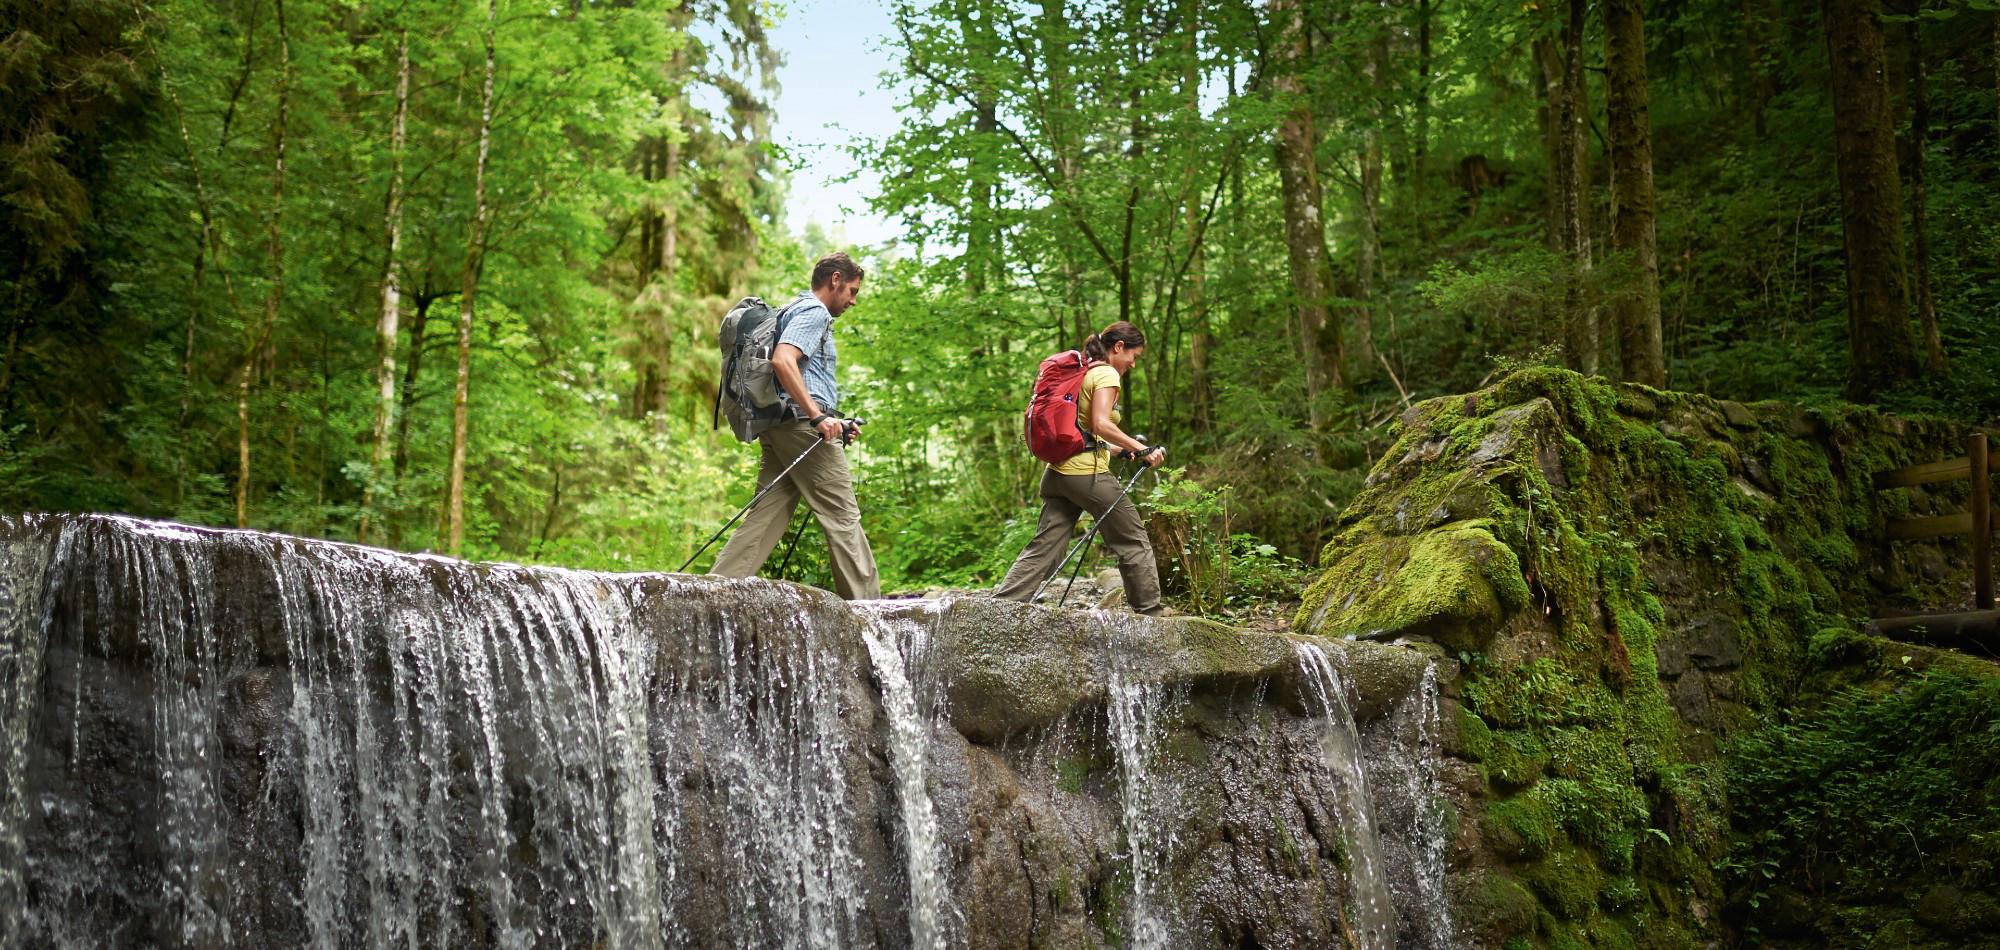 Wasserläufer - Wandertrilogie Allgäu